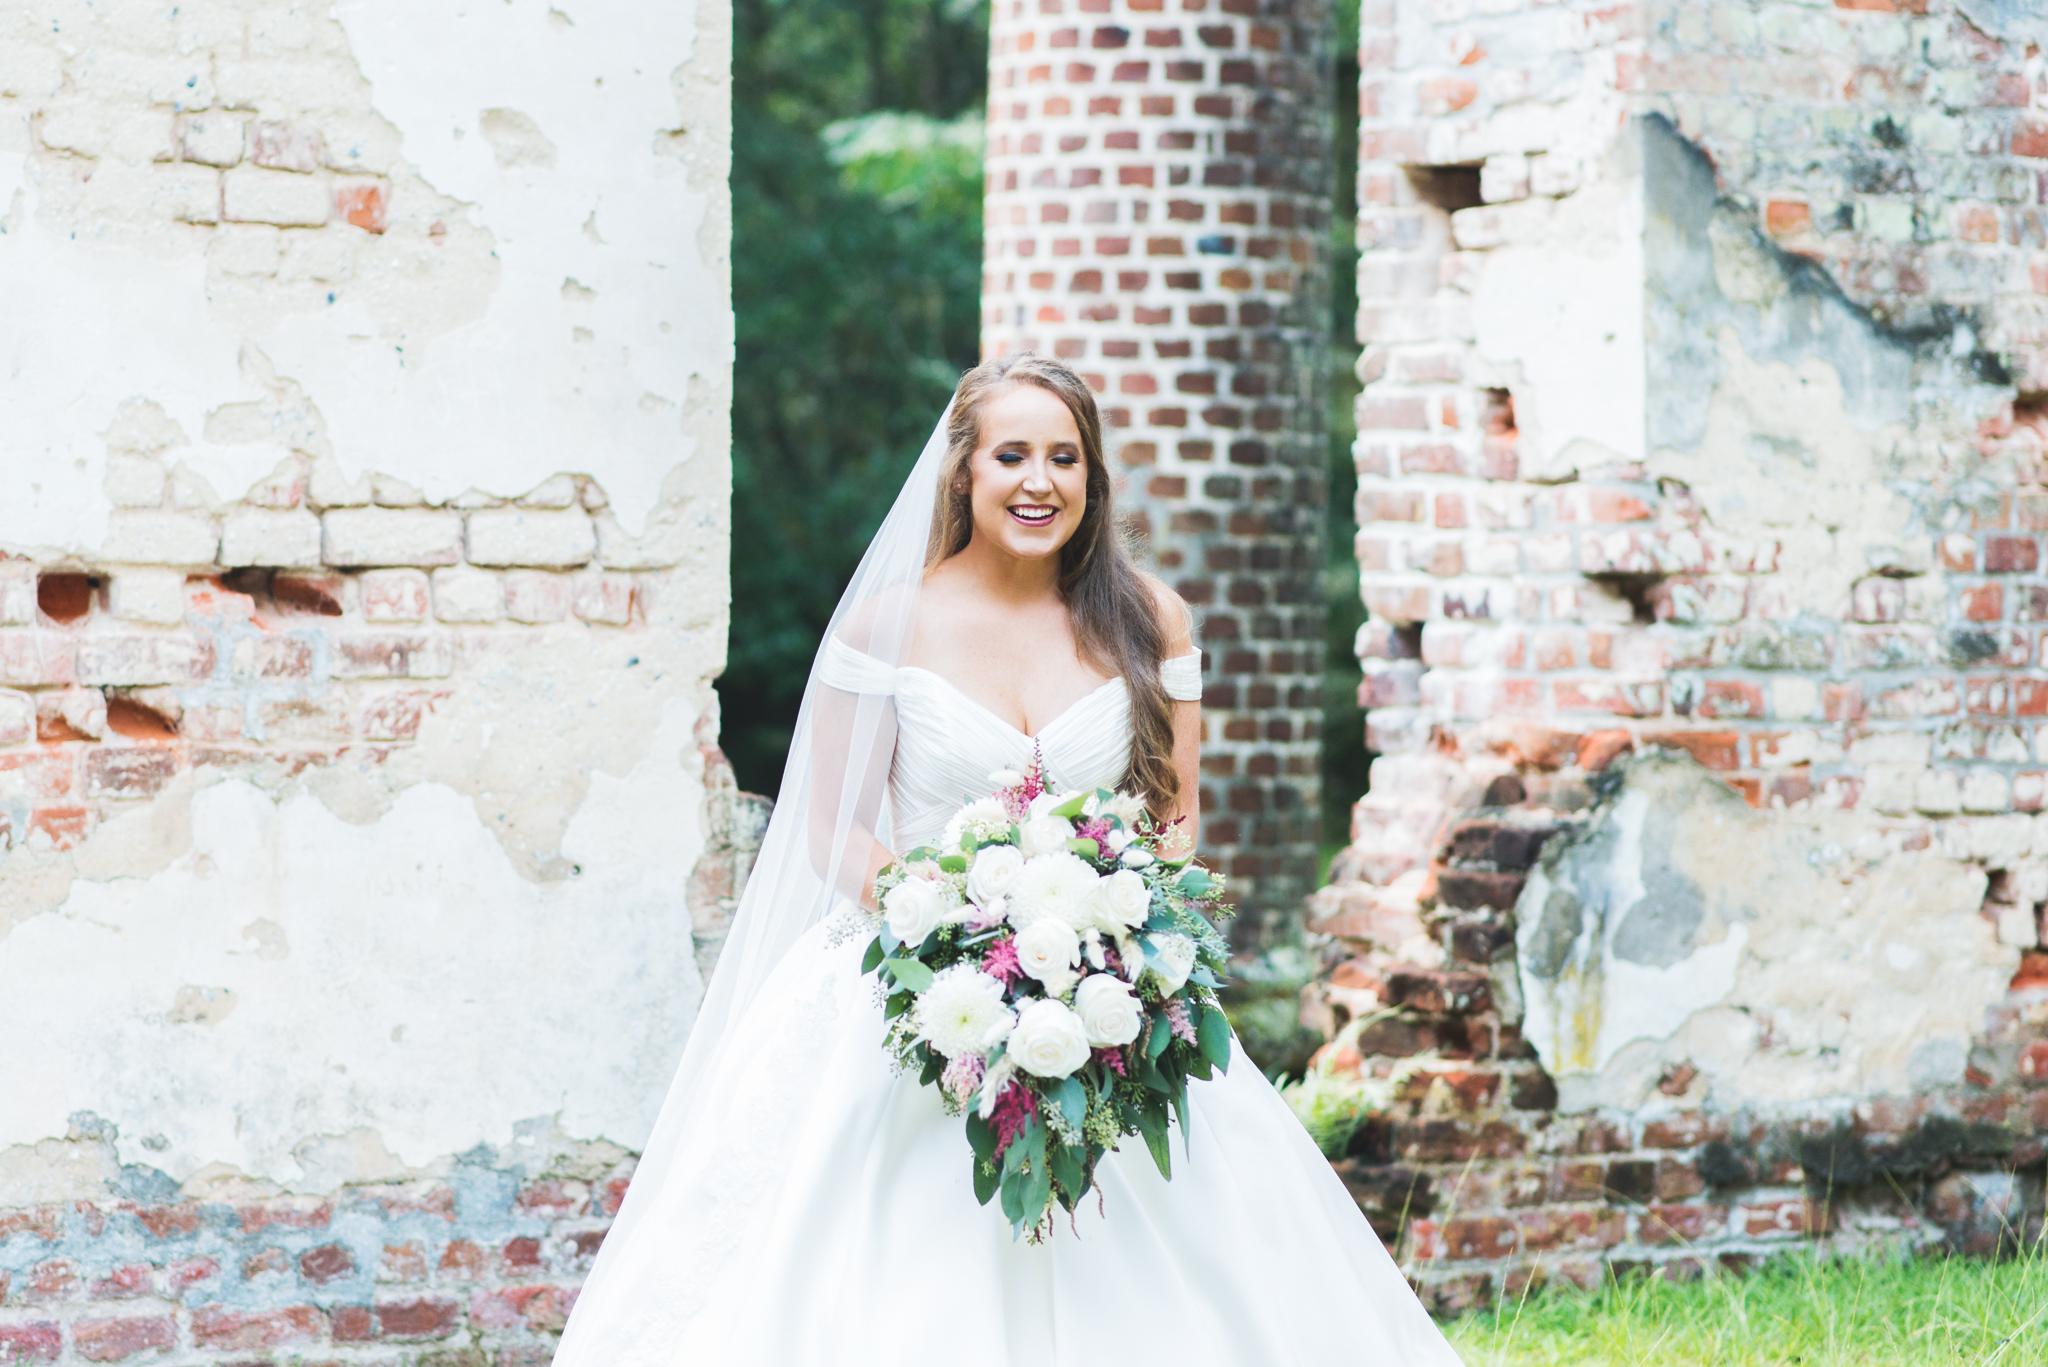 Bridals_AmberRay_blog-10.jpg